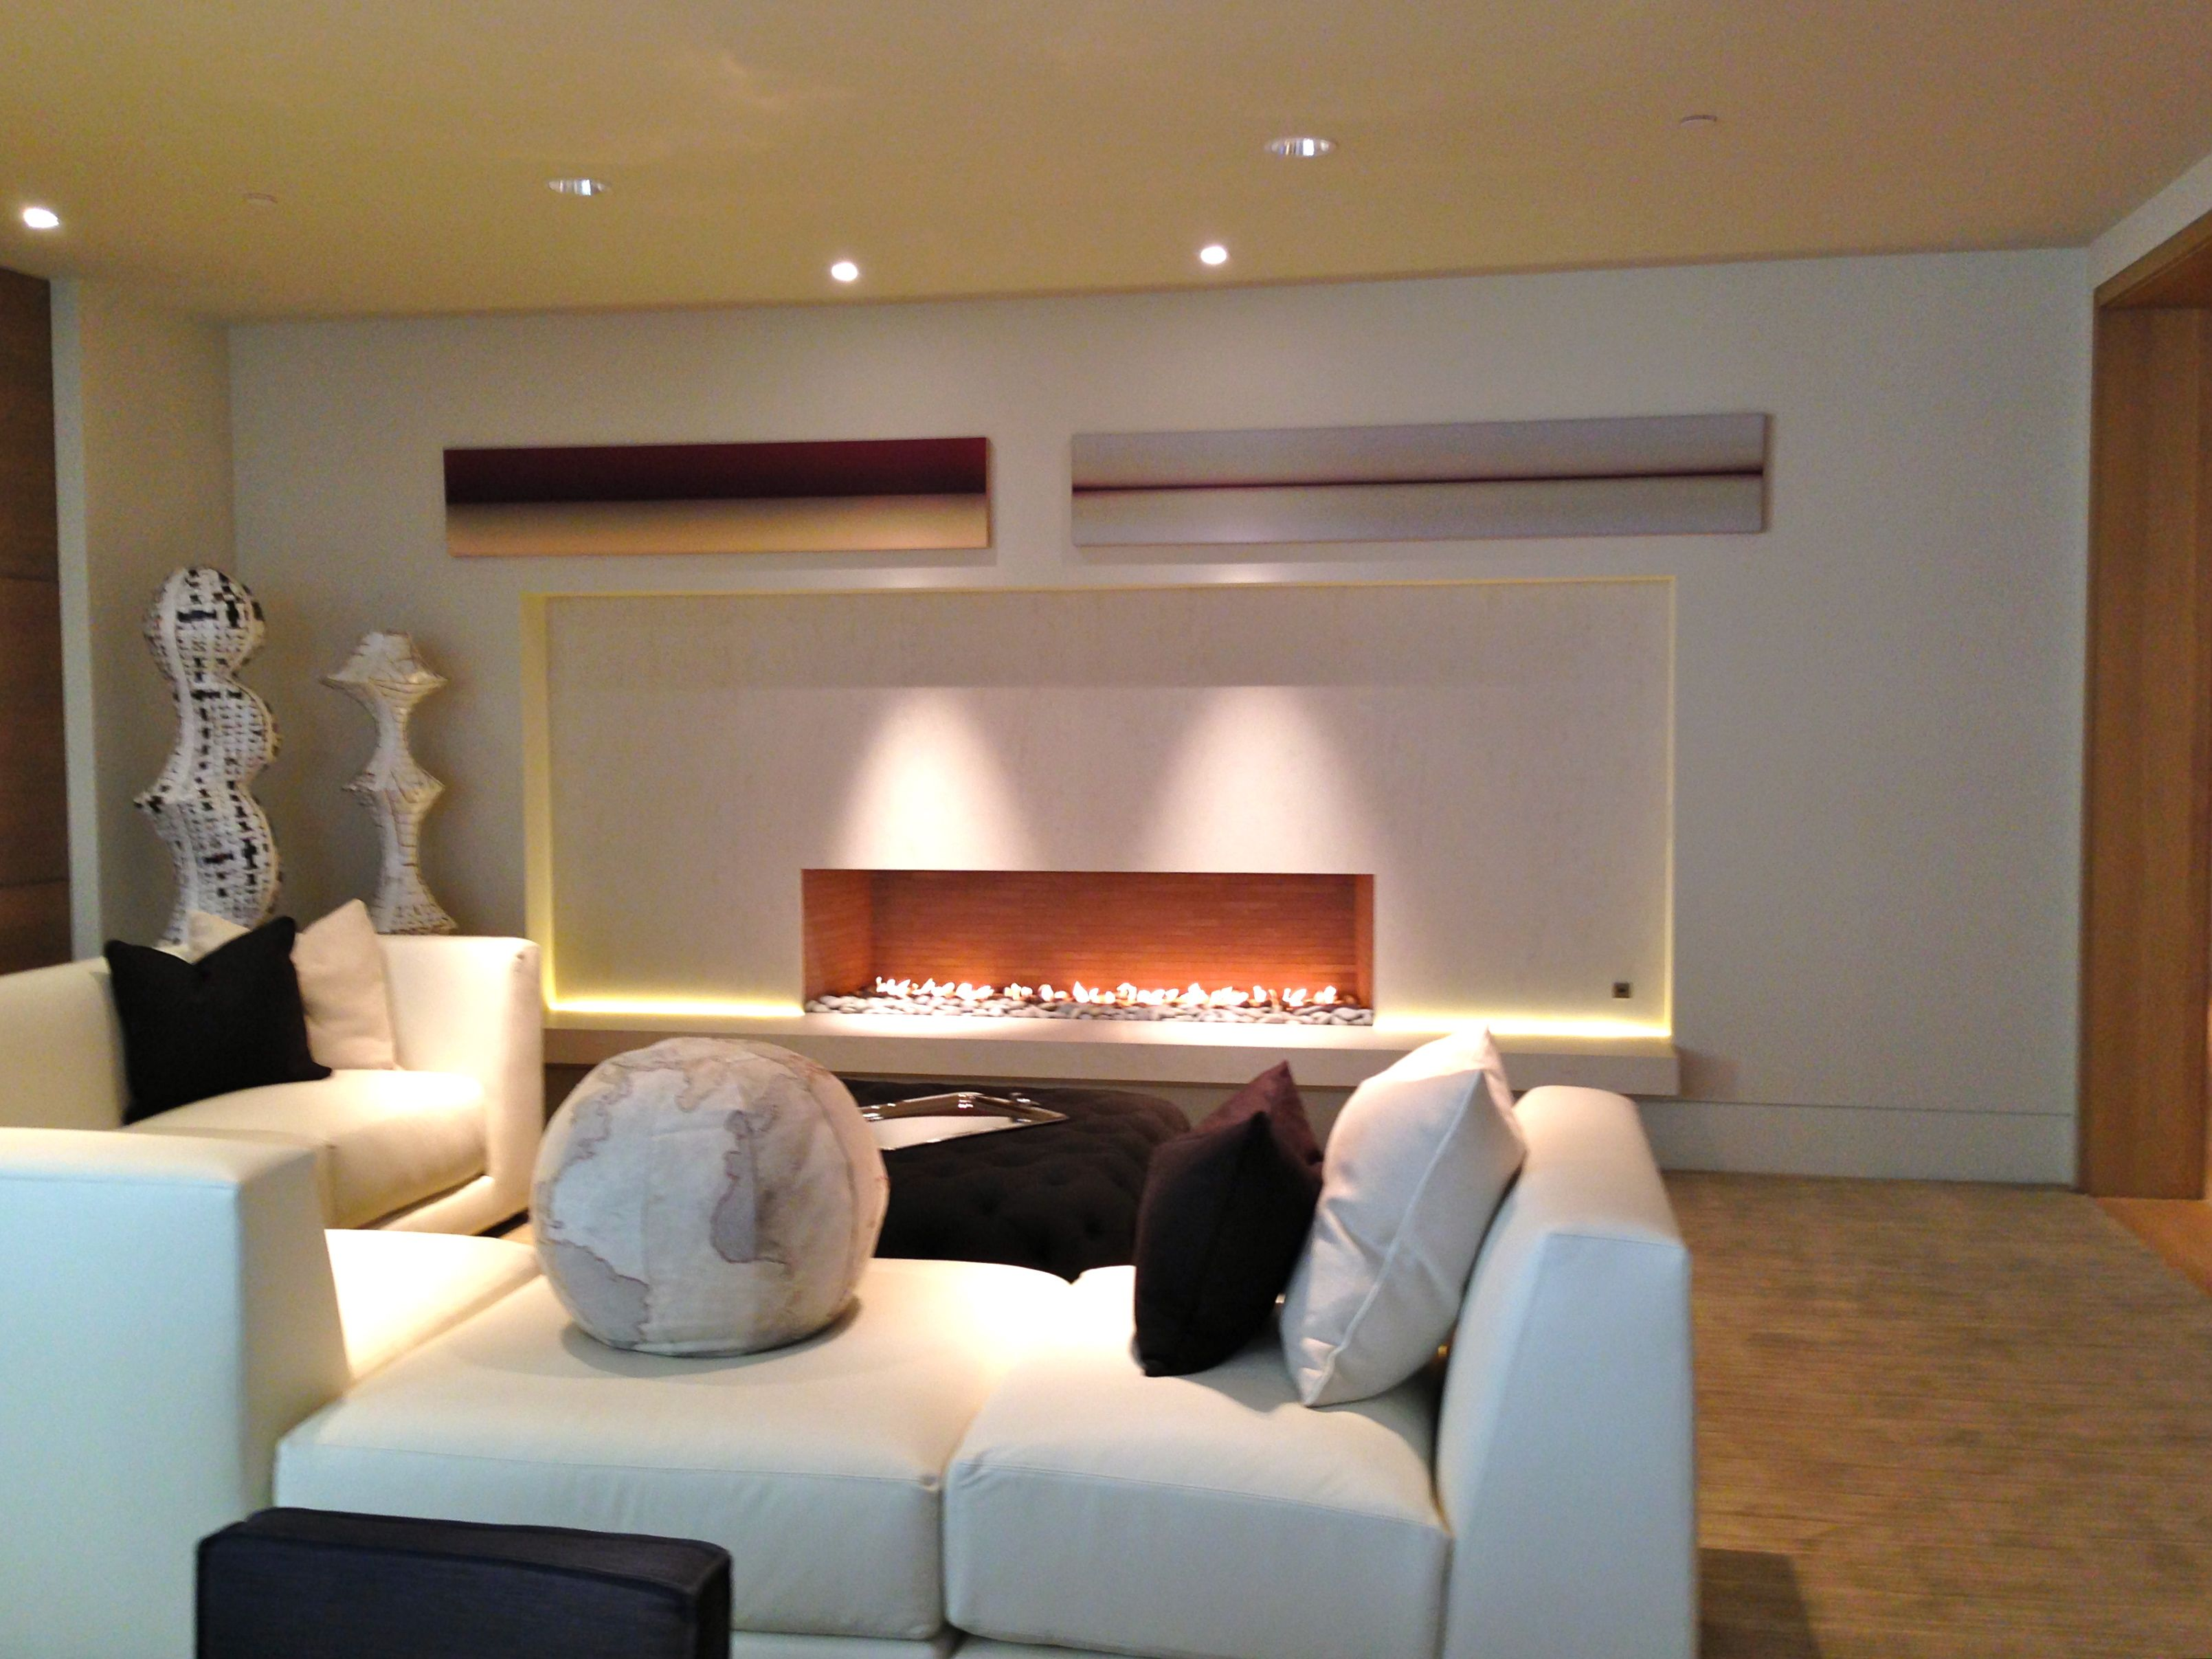 Long Fireplace Beautiful 8 Ft Long Linear Open Living Room Fireplace